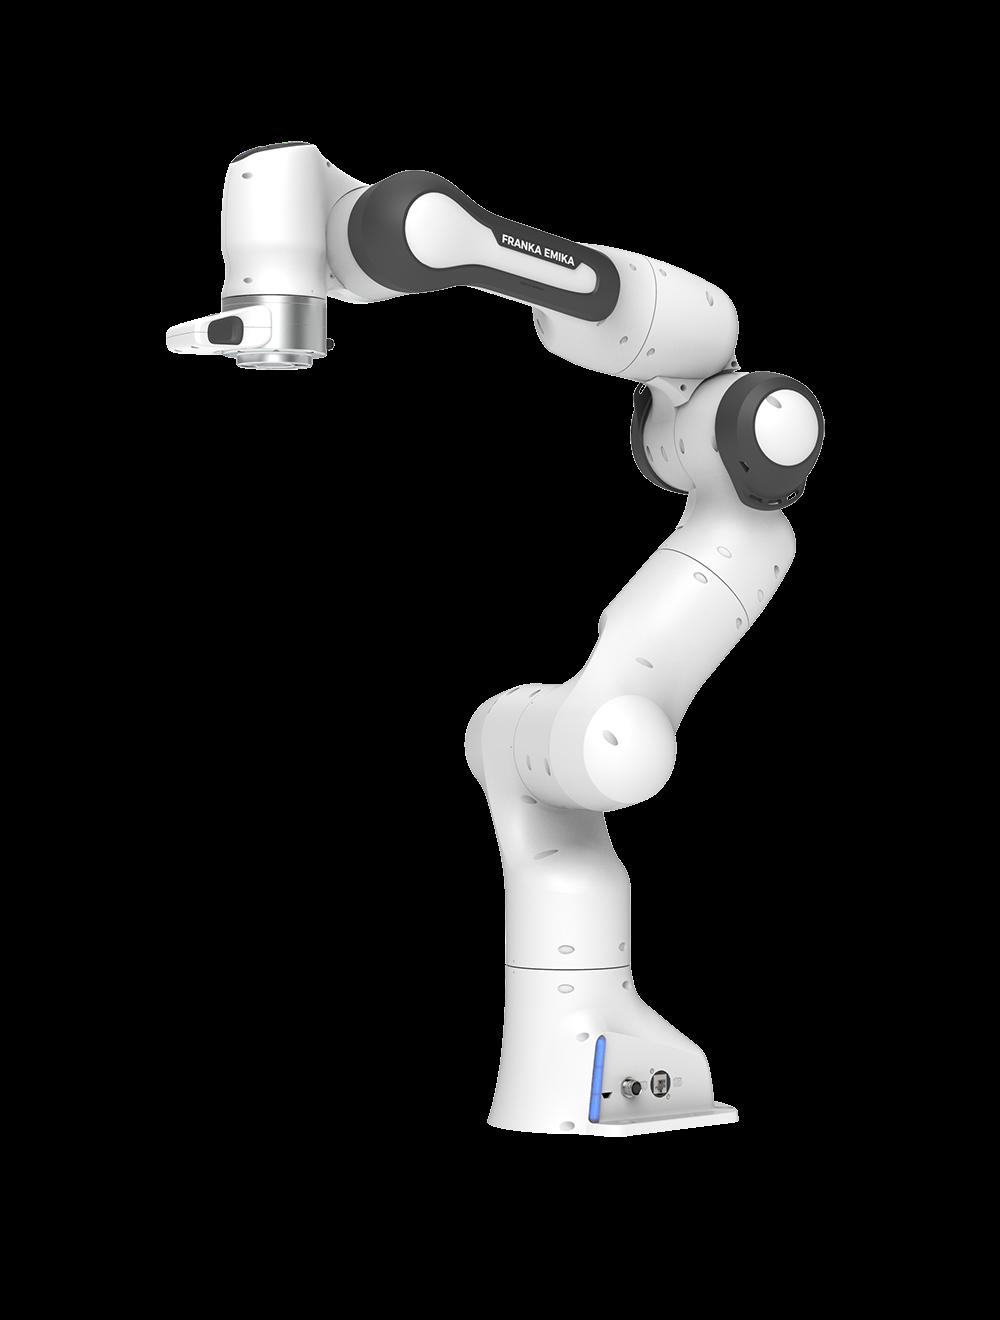 Franka Emika Panda Robot